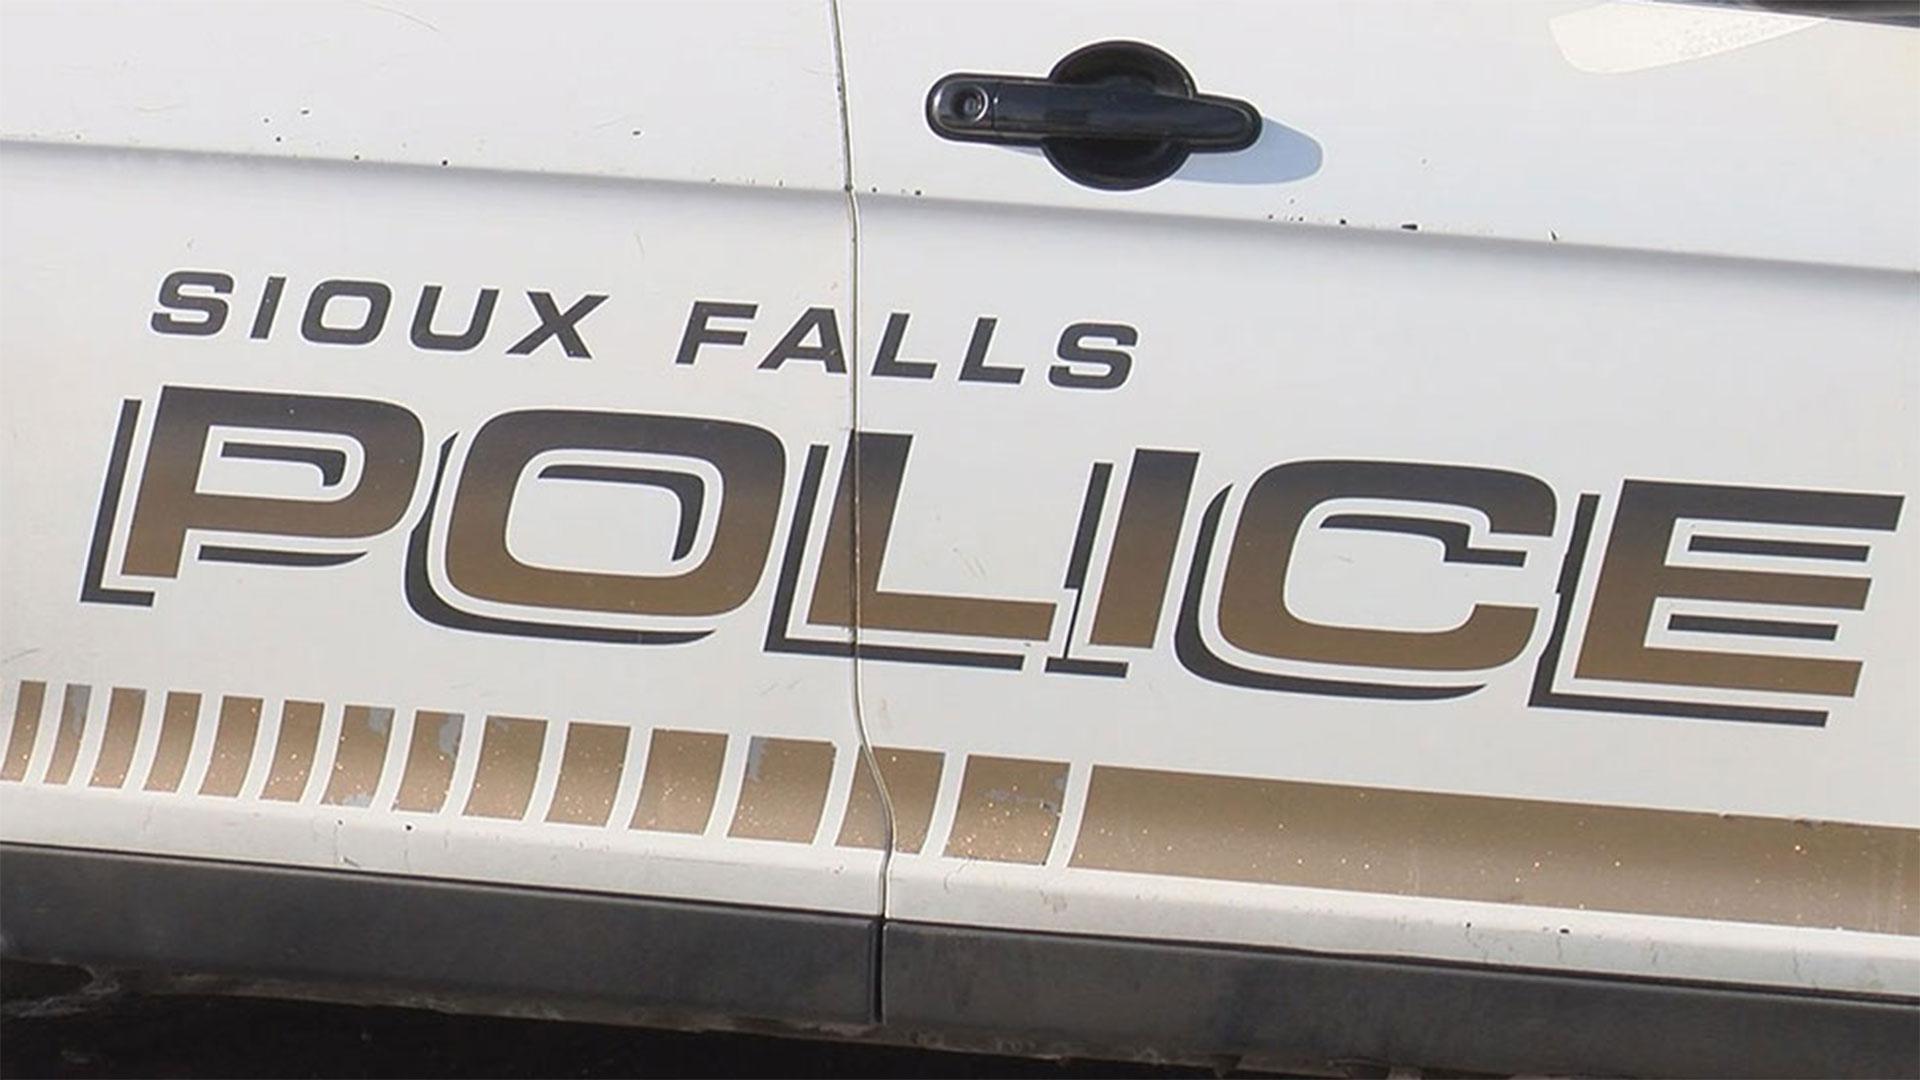 KELO Sioux Falls Police car